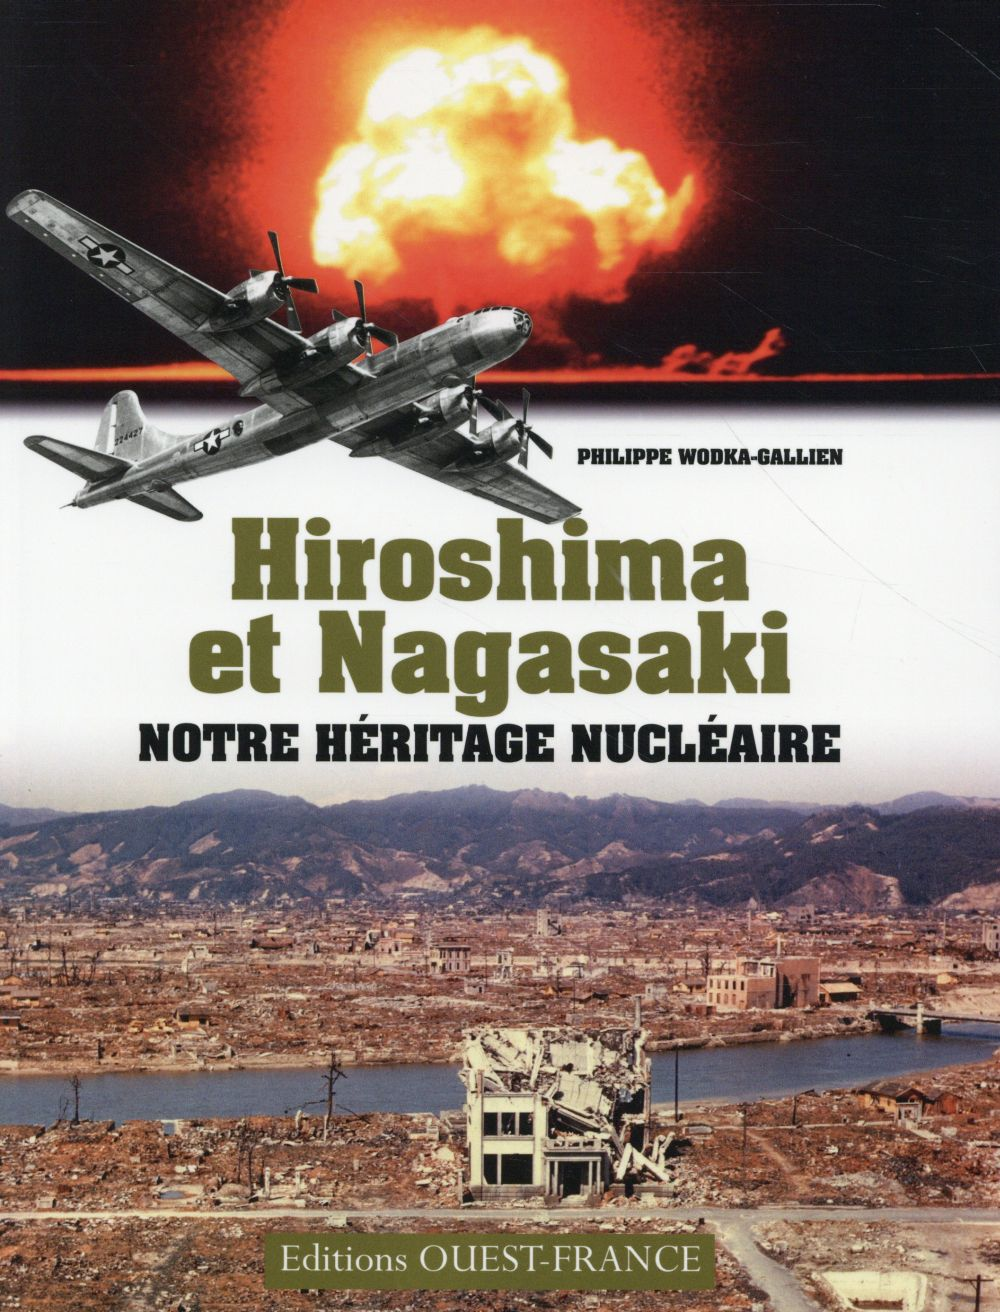 HIROSHIMA ET NAGASAKI, NOTRE HERITAGE NUCLEAIRE